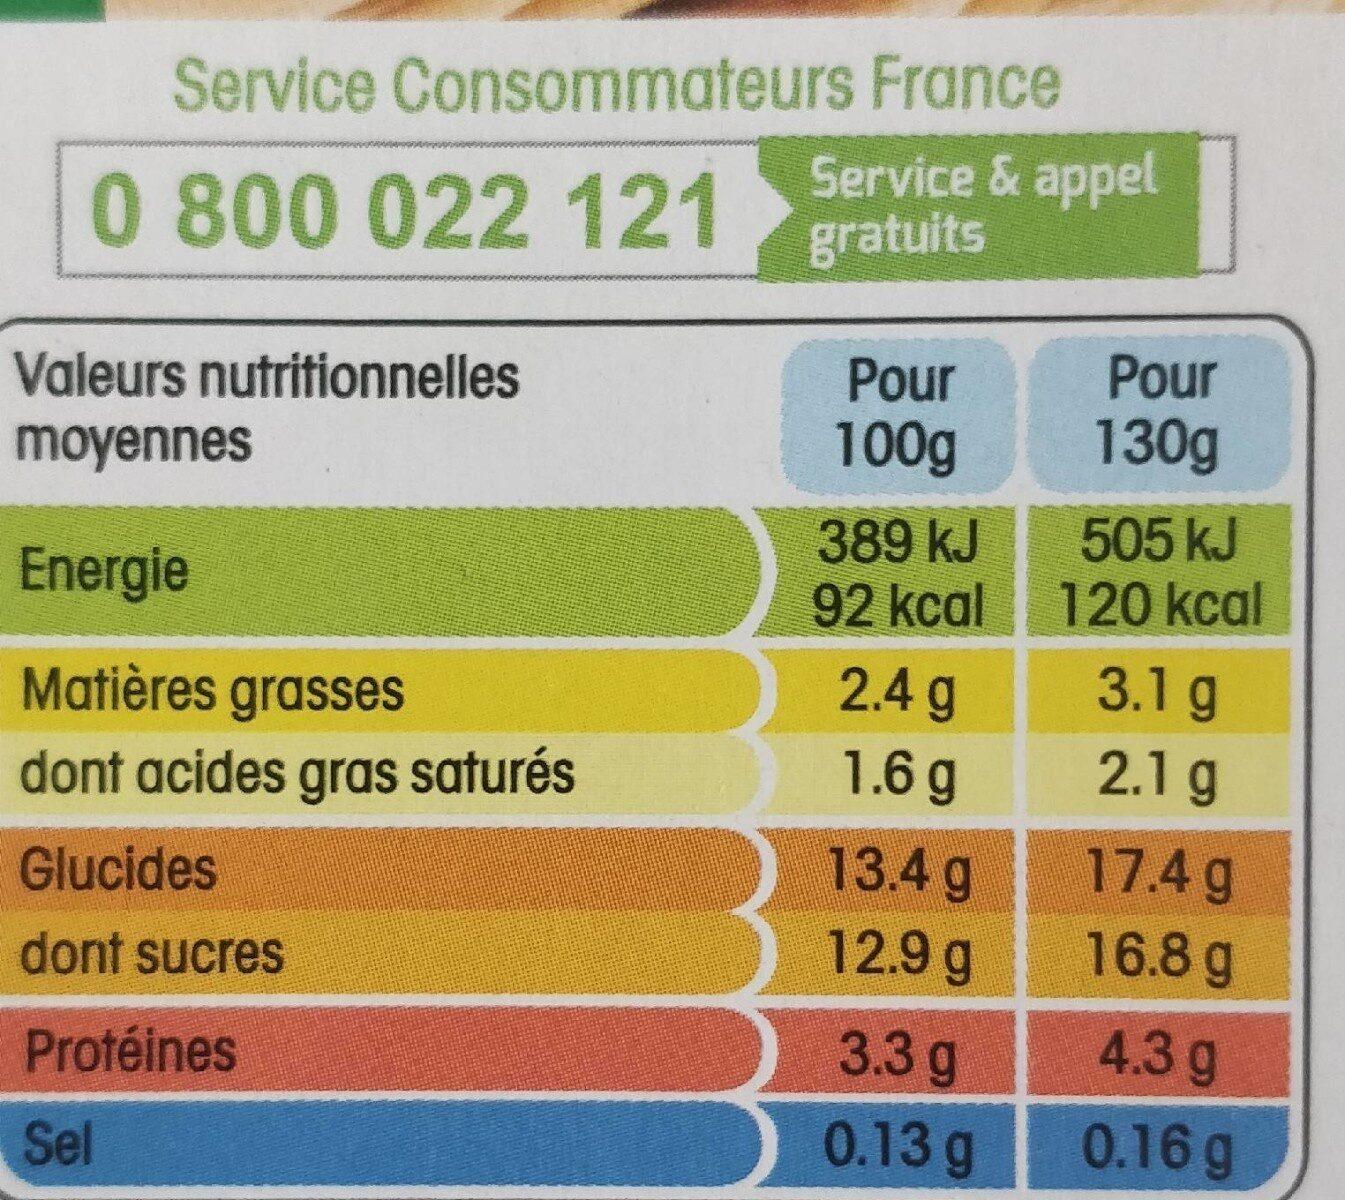 Panier de Yoplait - Informazioni nutrizionali - fr